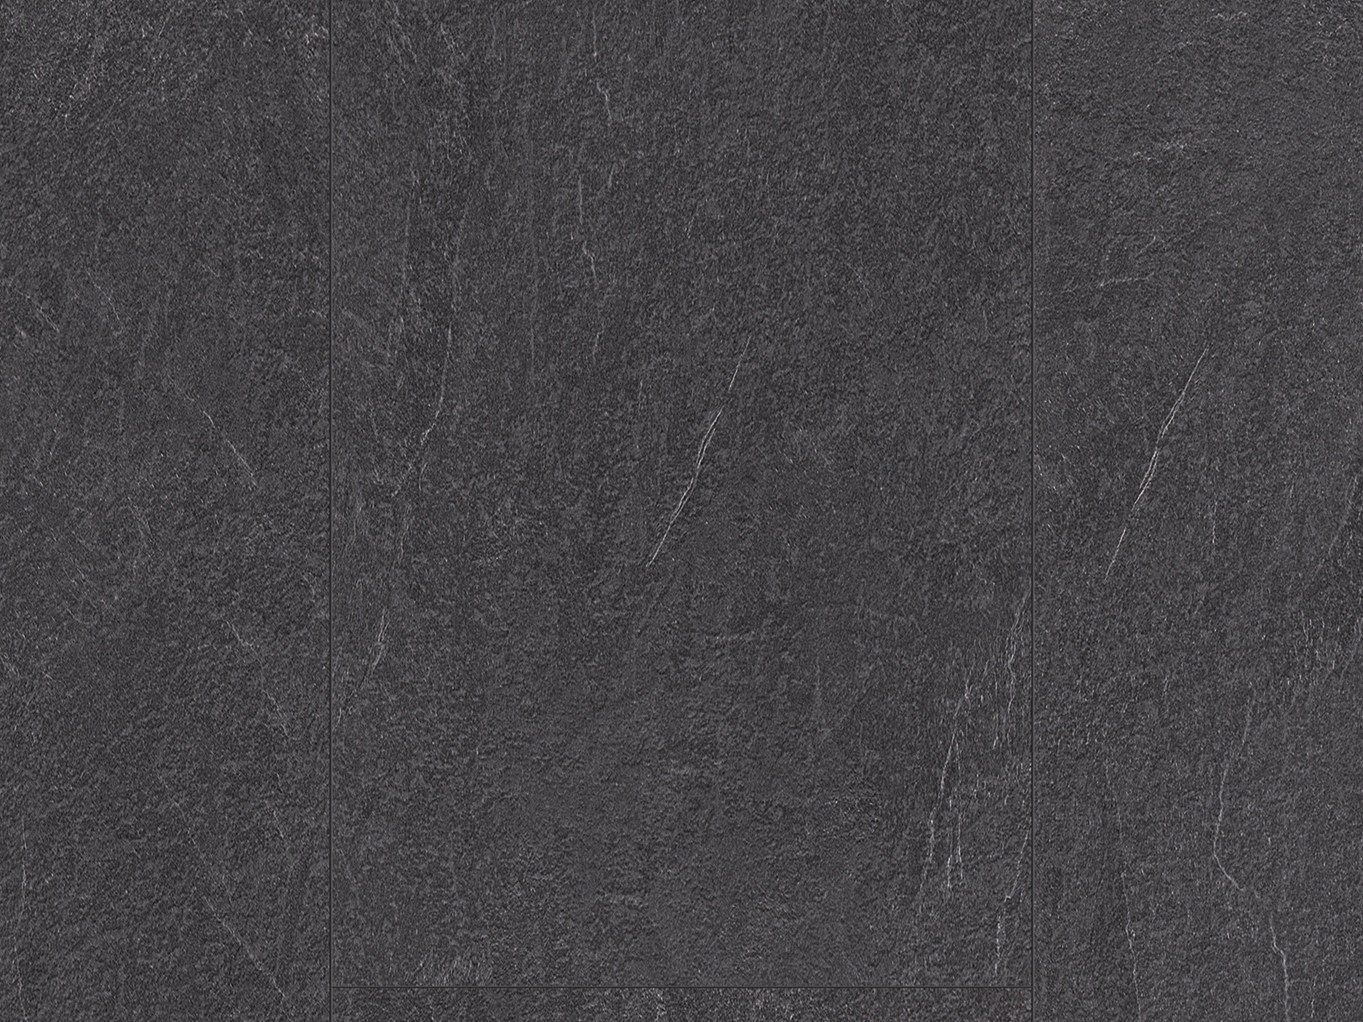 rev tement de sol en stratifi effet pierre ardoise charbon by pergo. Black Bedroom Furniture Sets. Home Design Ideas